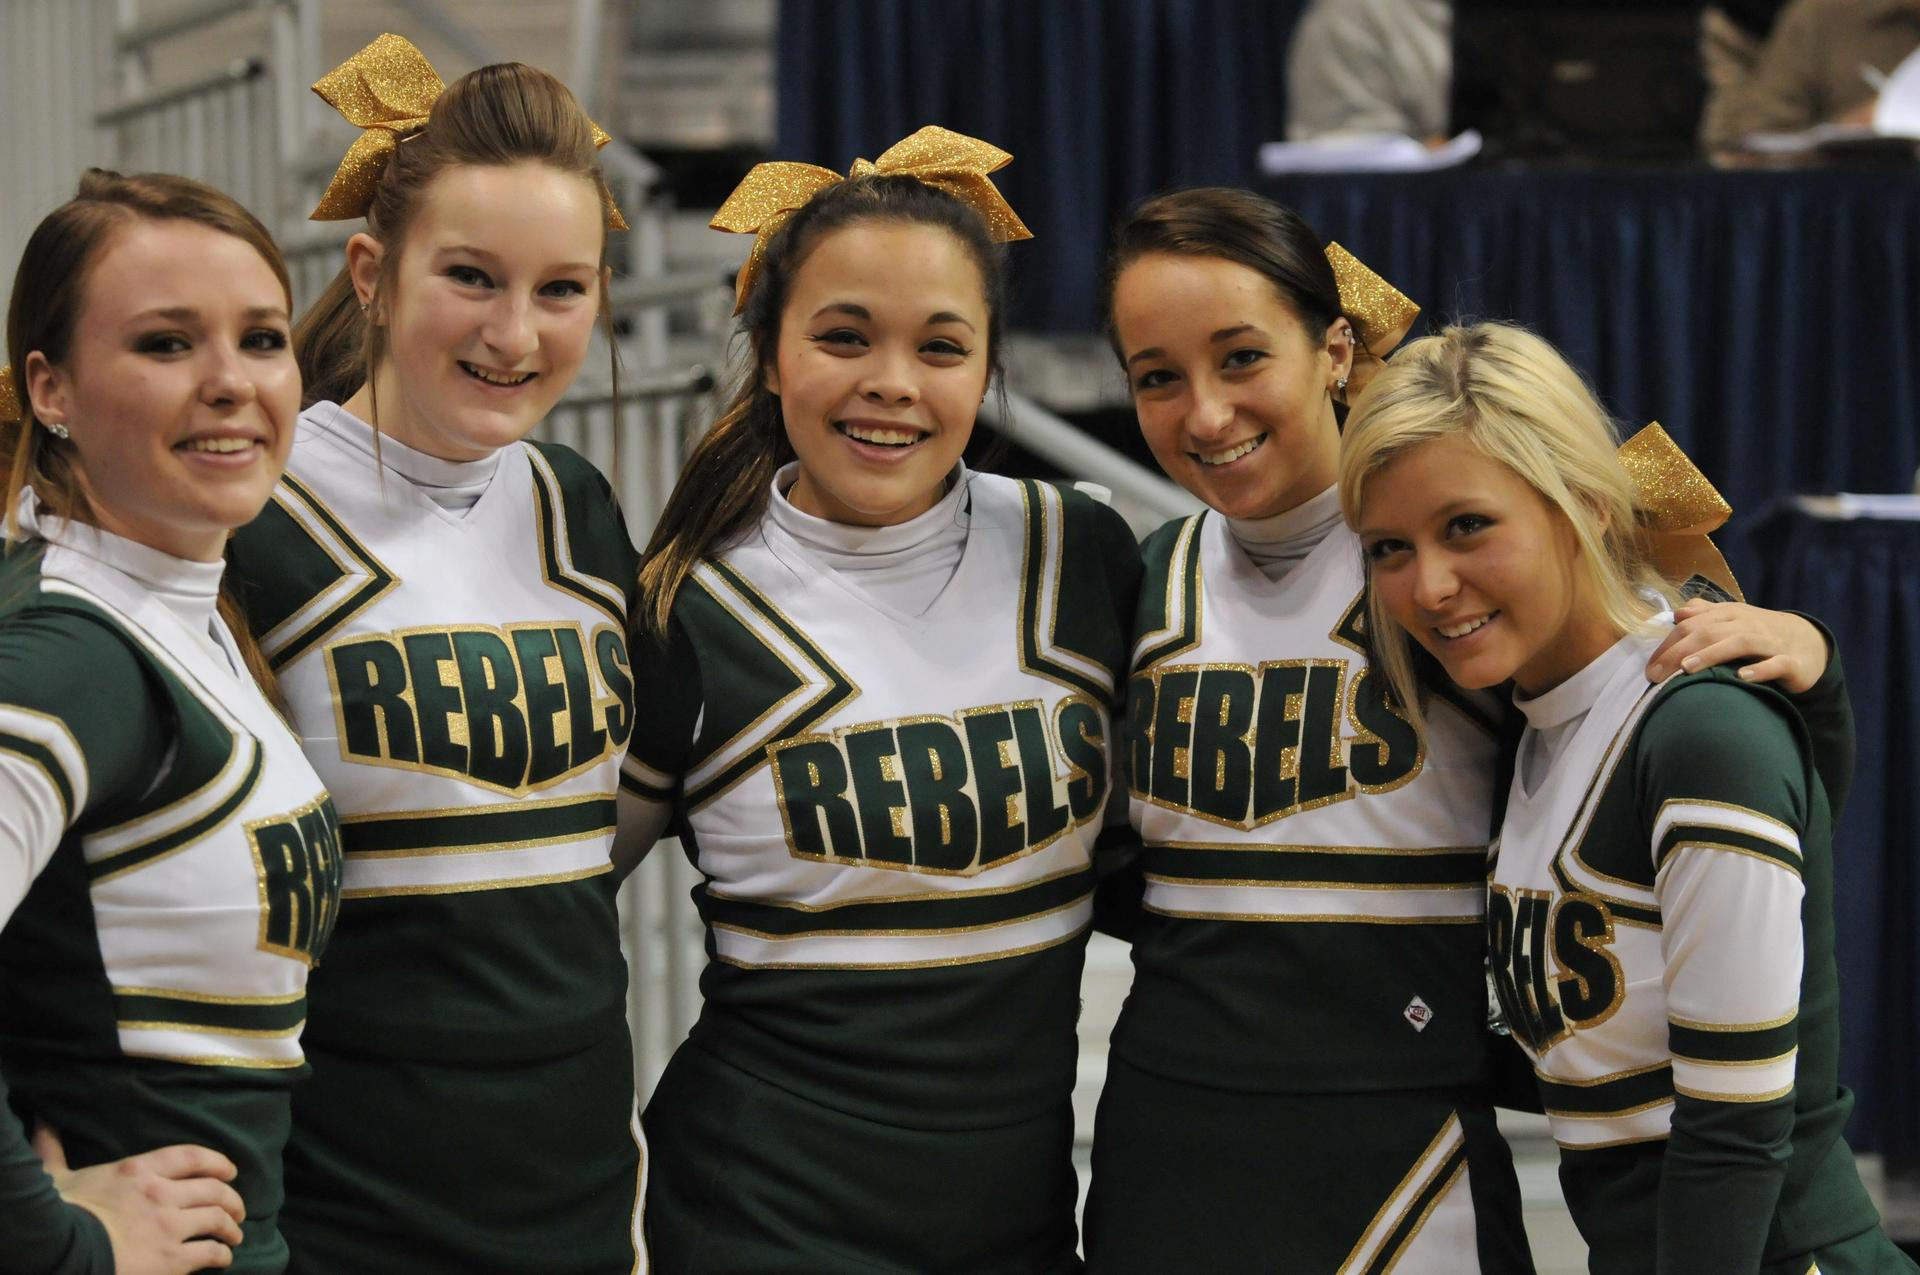 Cheerleaders at basketball game